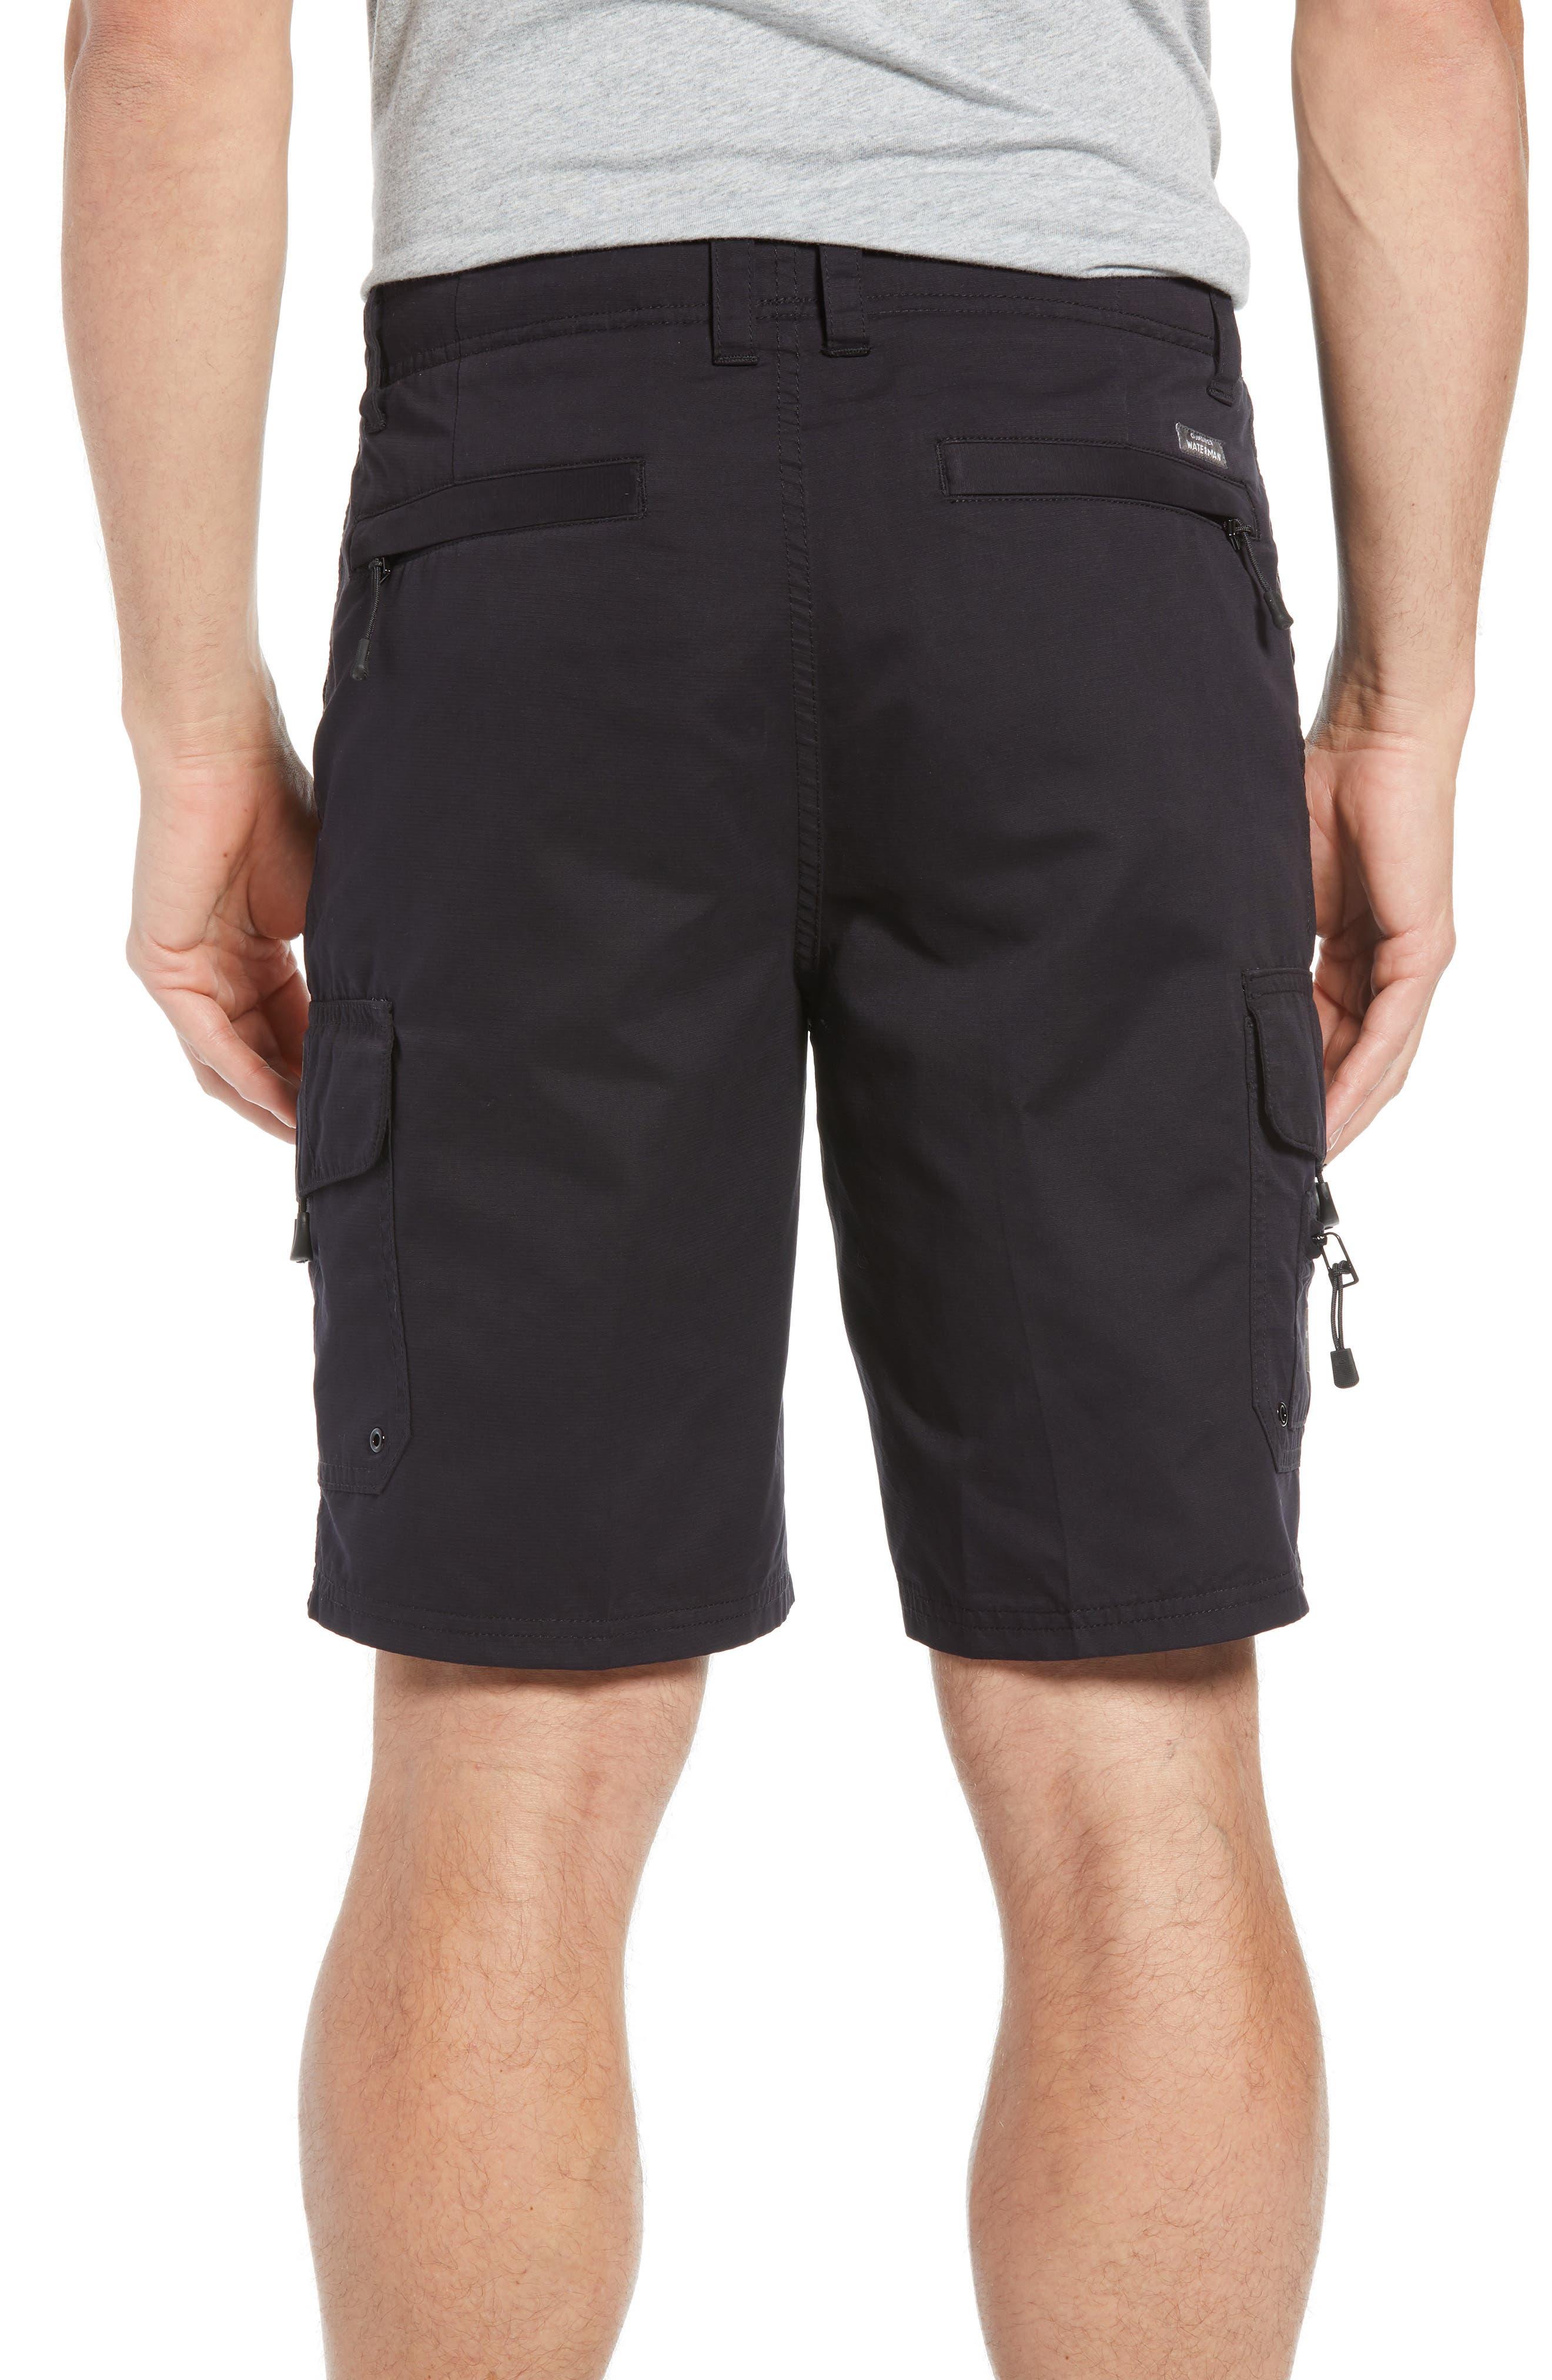 QUIKSILVER WATERMAN COLLECTION, Maldive Regular Fit Cargo Shorts, Alternate thumbnail 2, color, 001